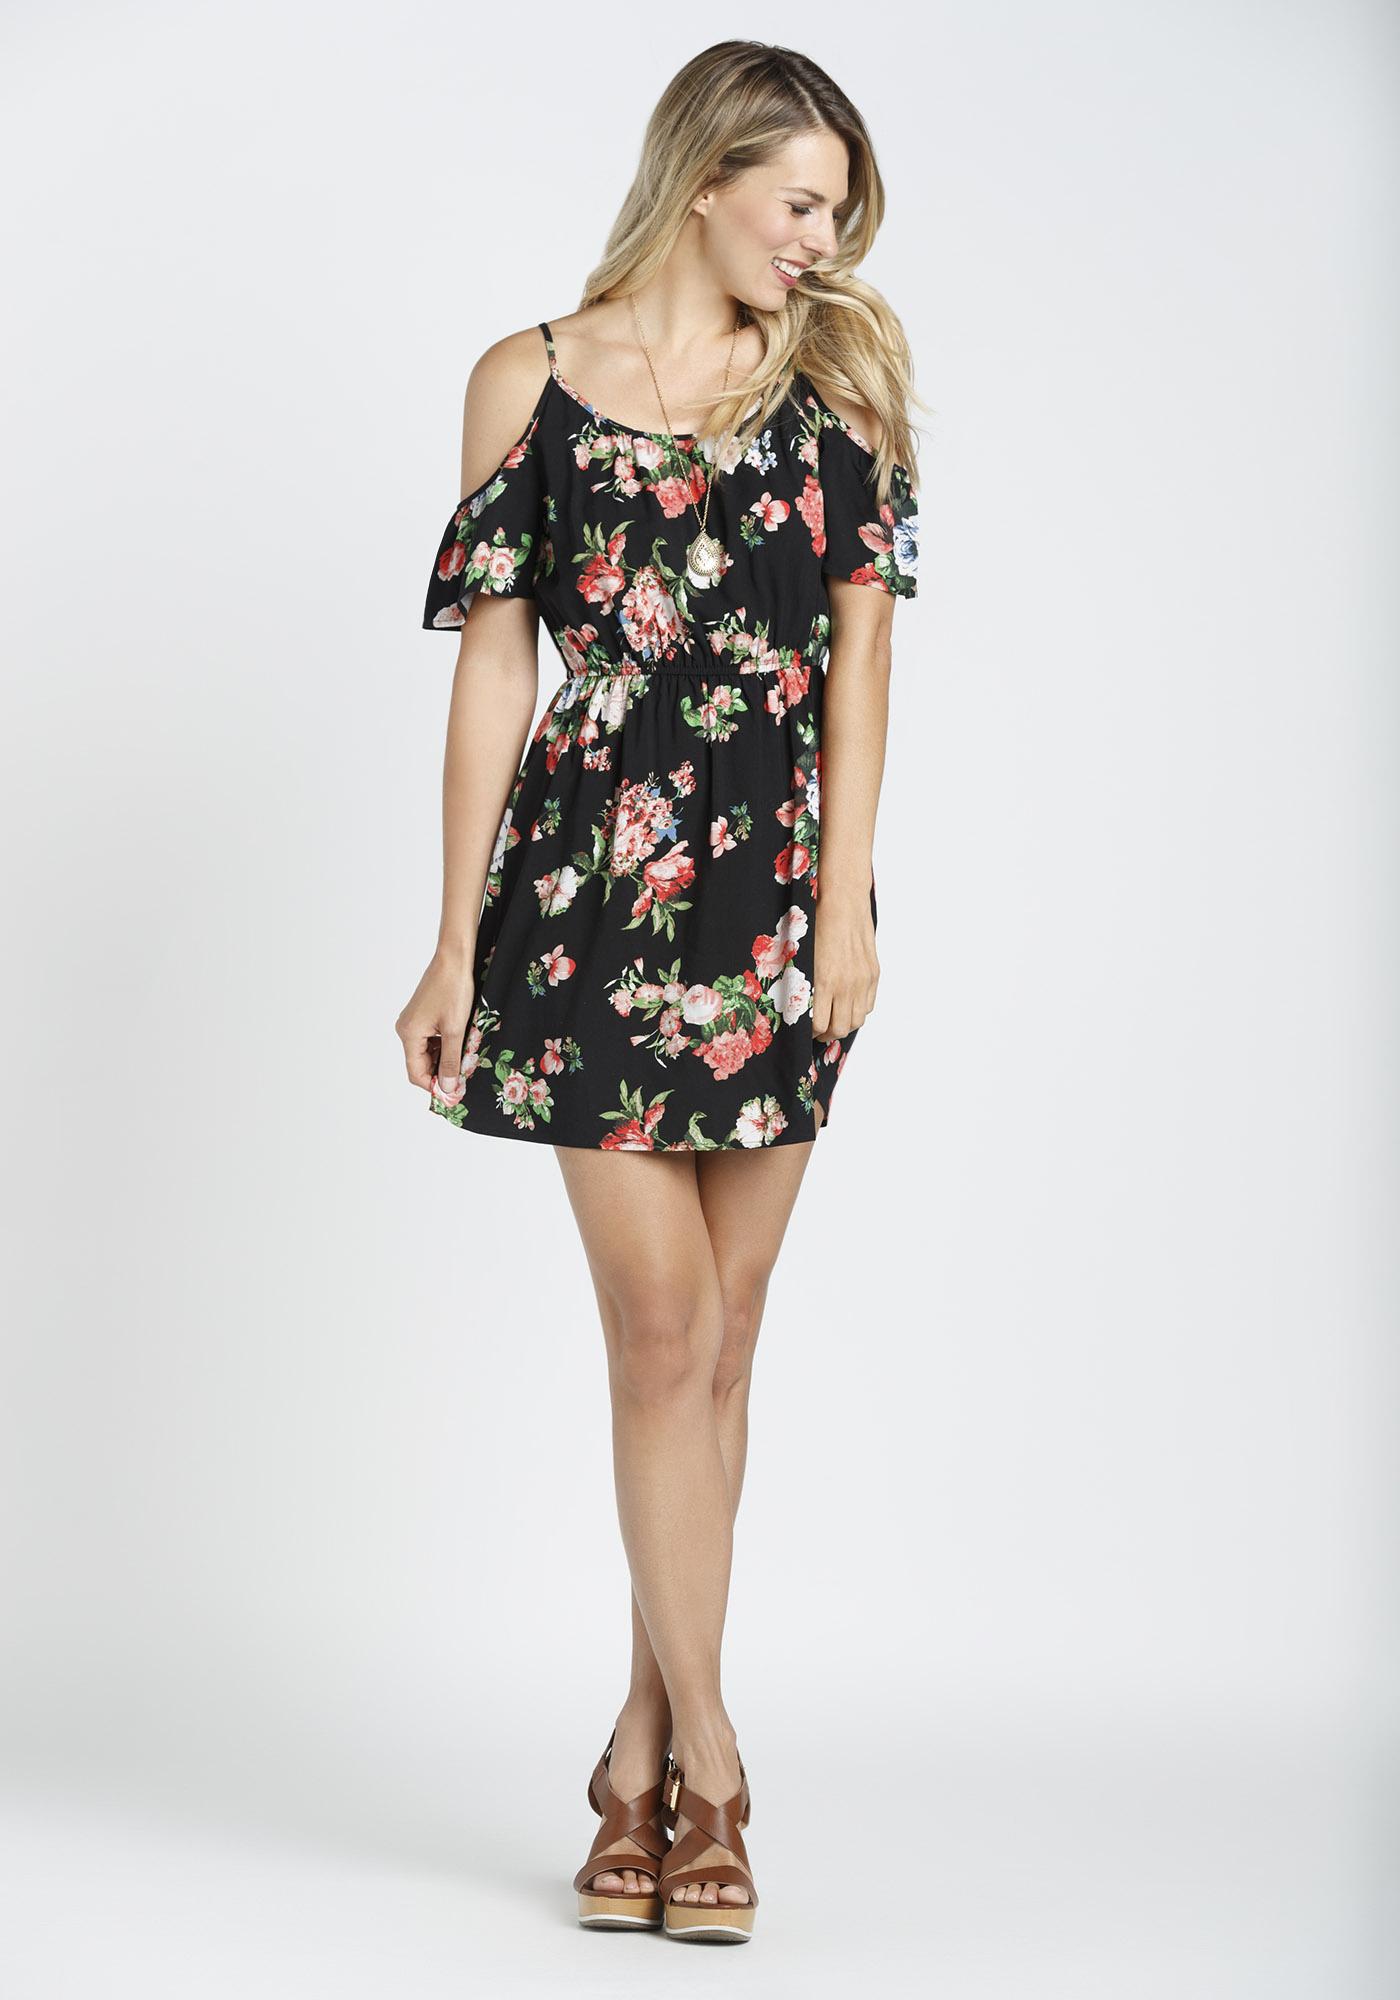 beb78e448c48b ... Ladies Floral Cold Shoulder Dress